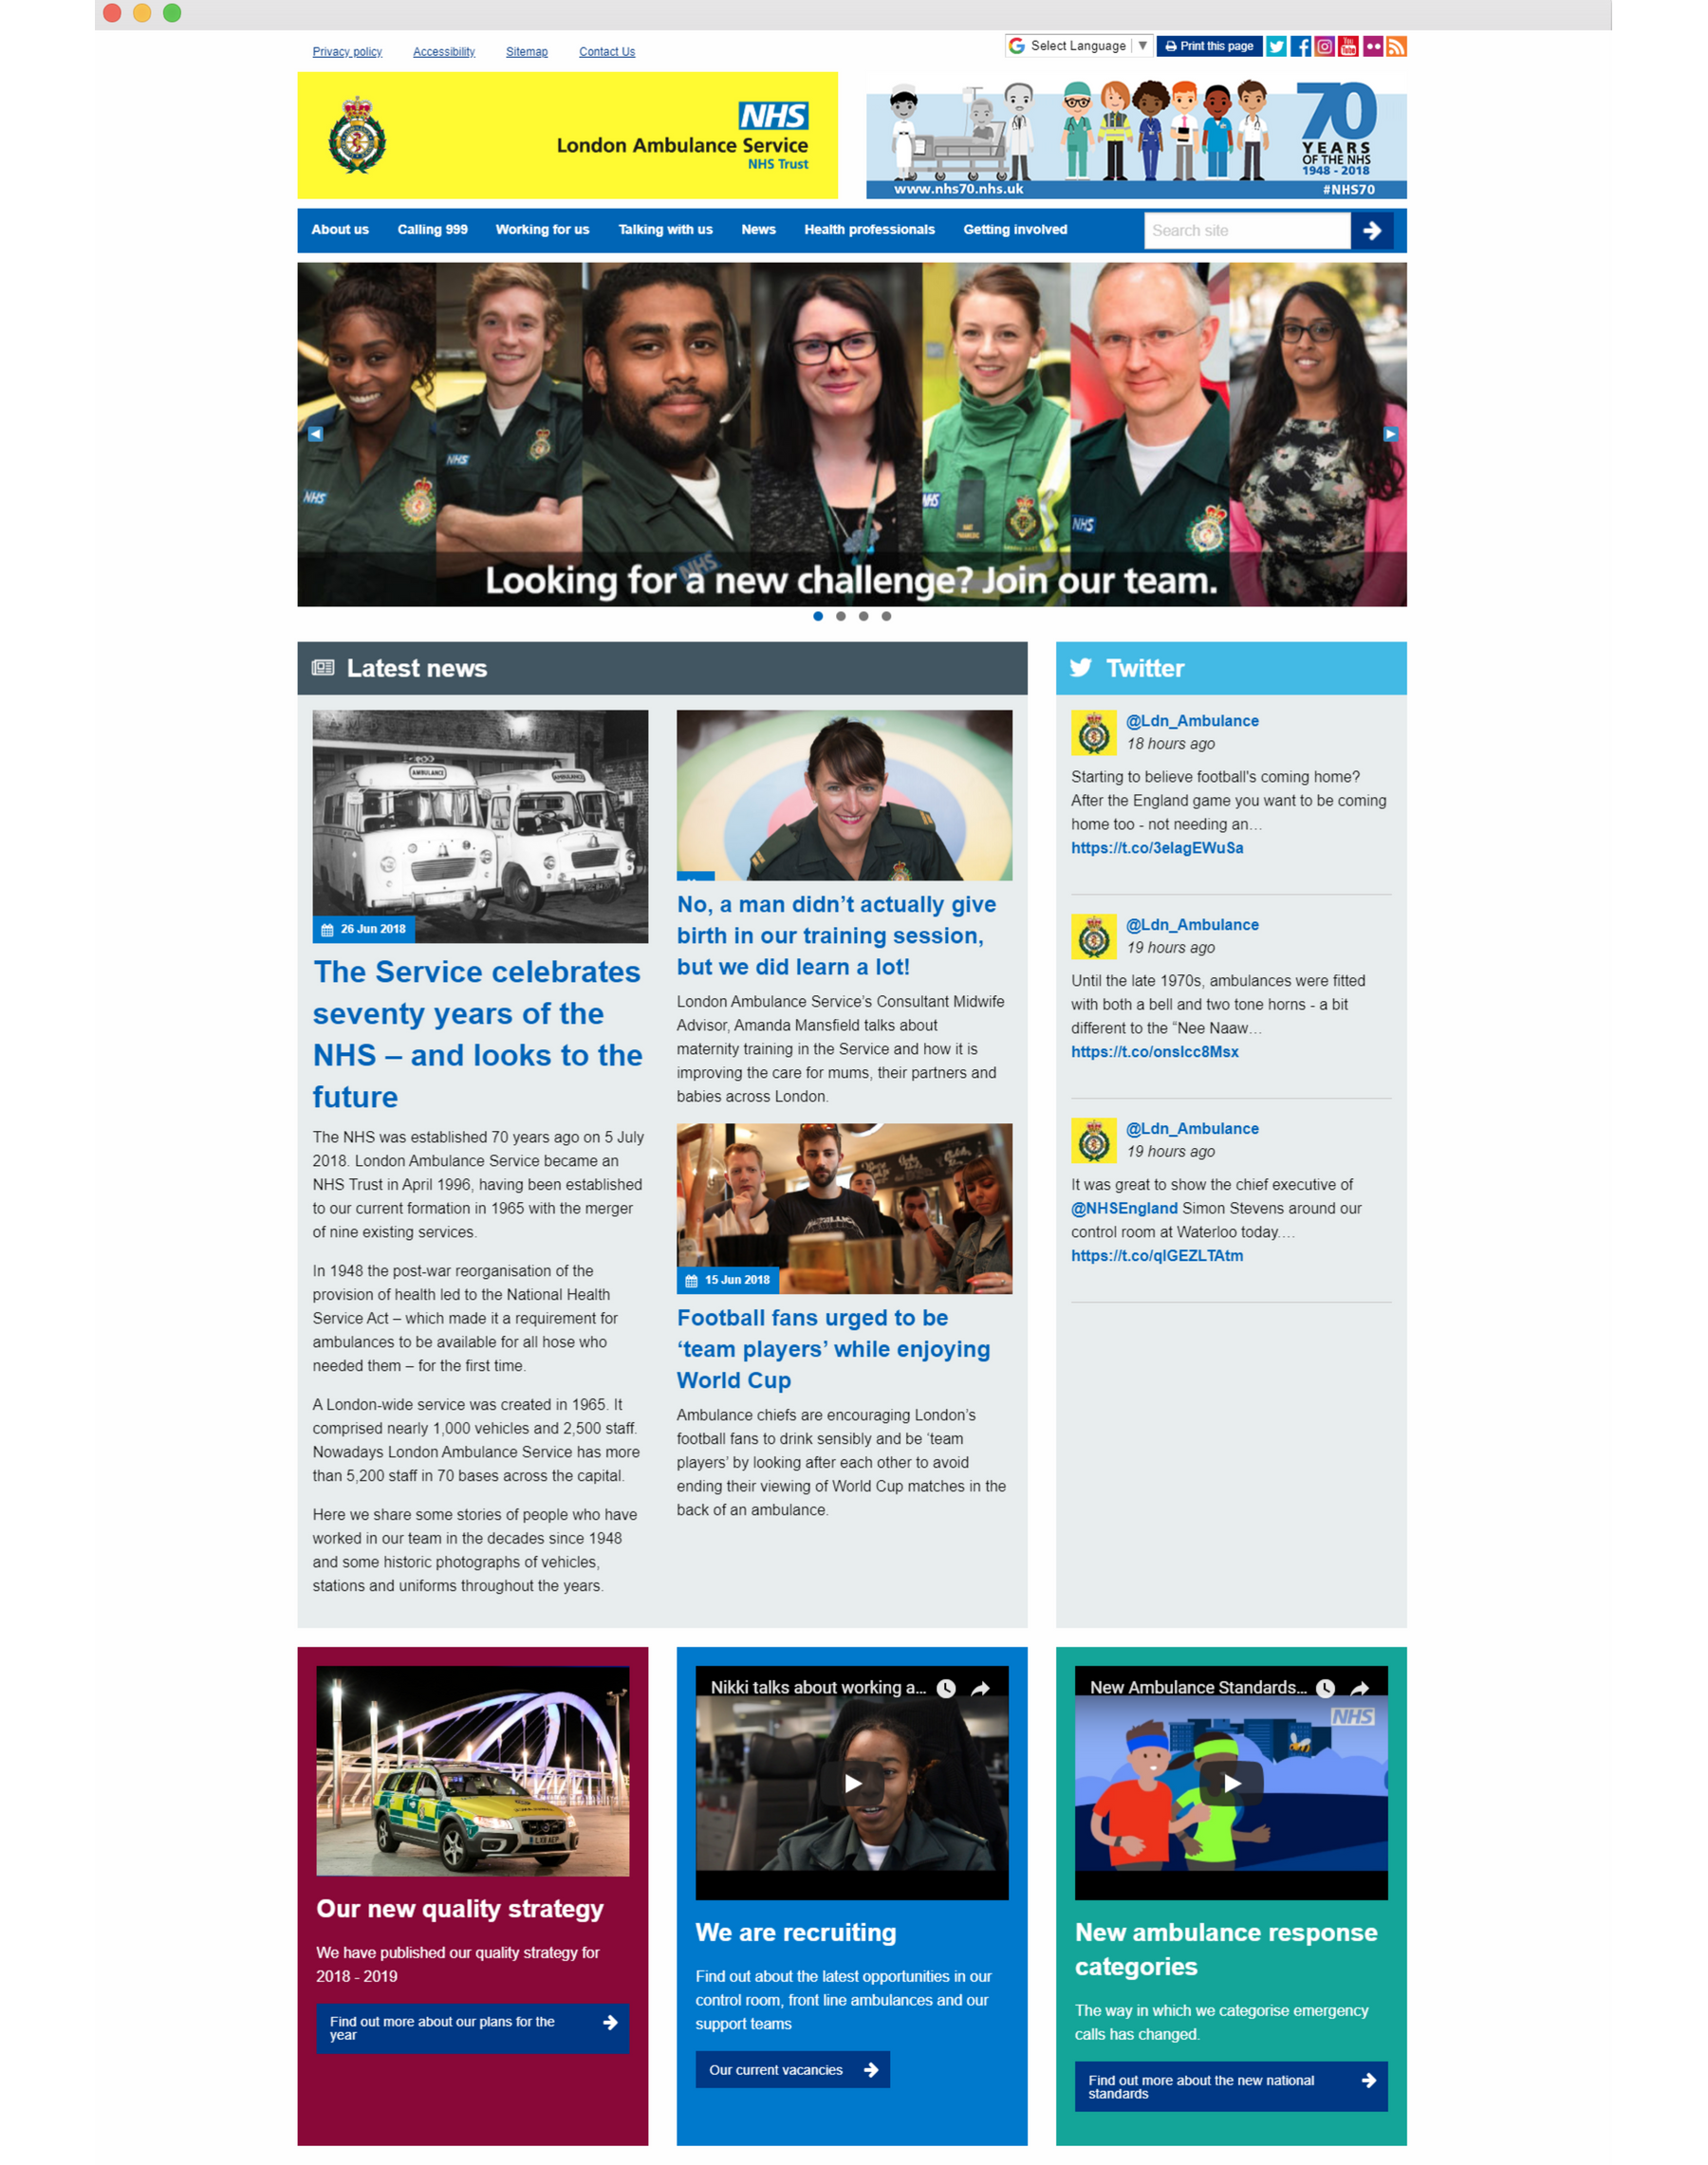 London Ambulance Service website in desktop view